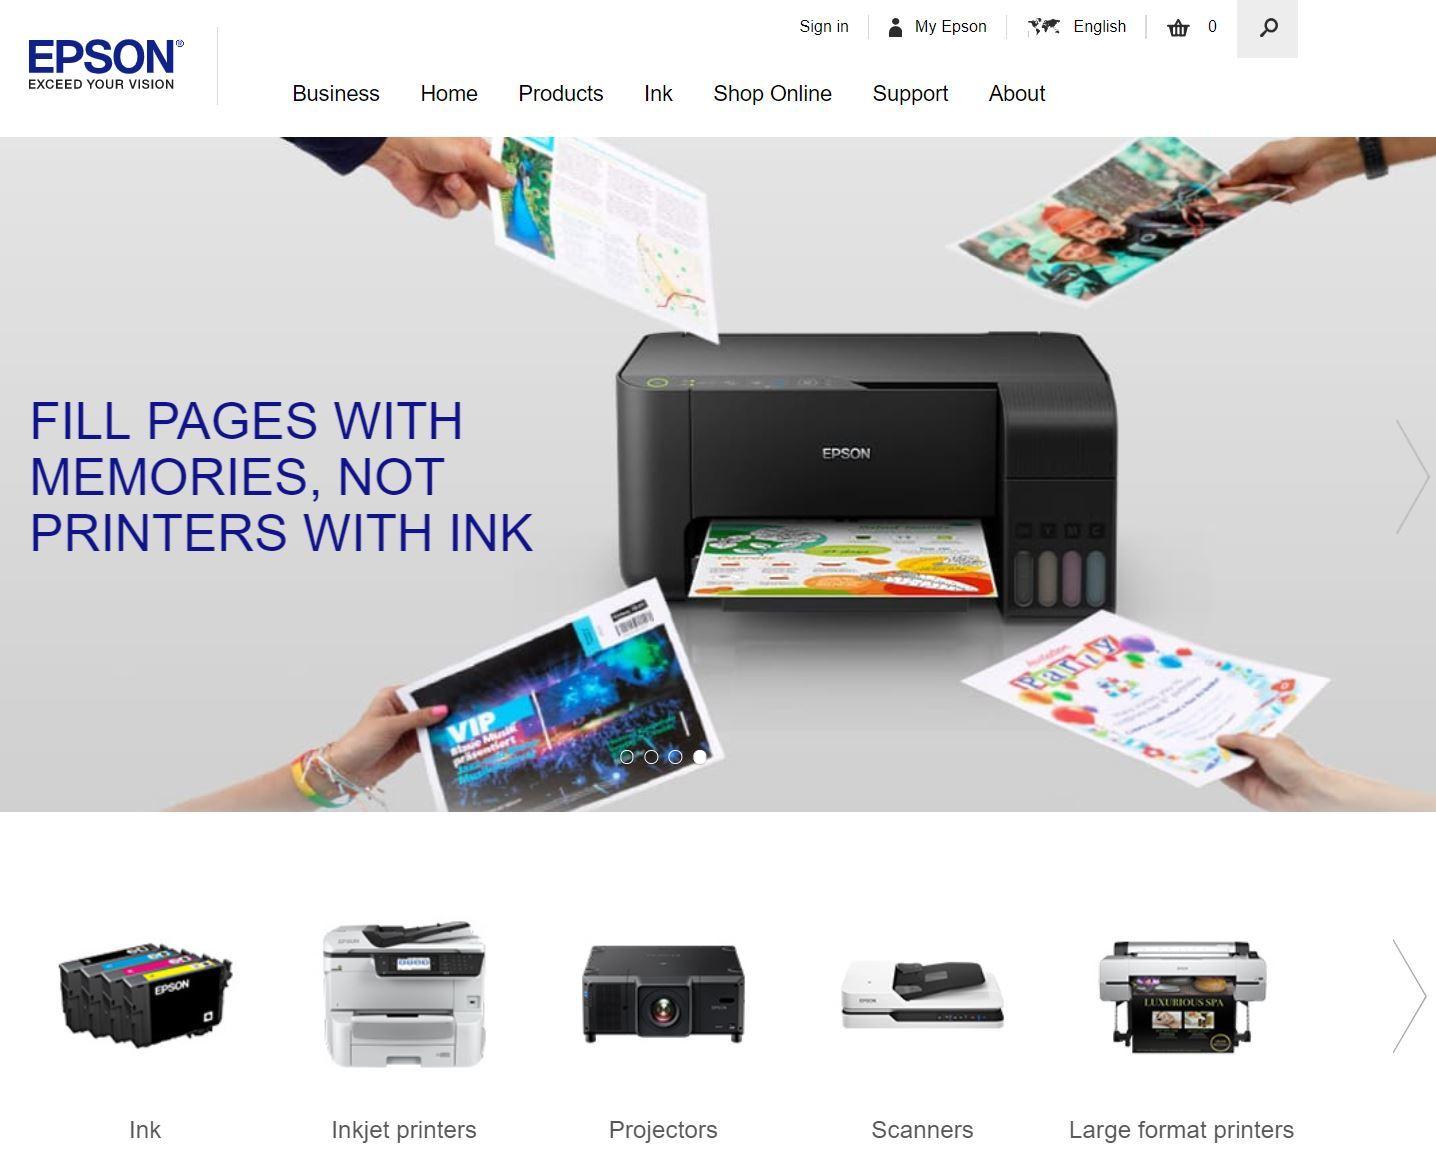 Epson homepage